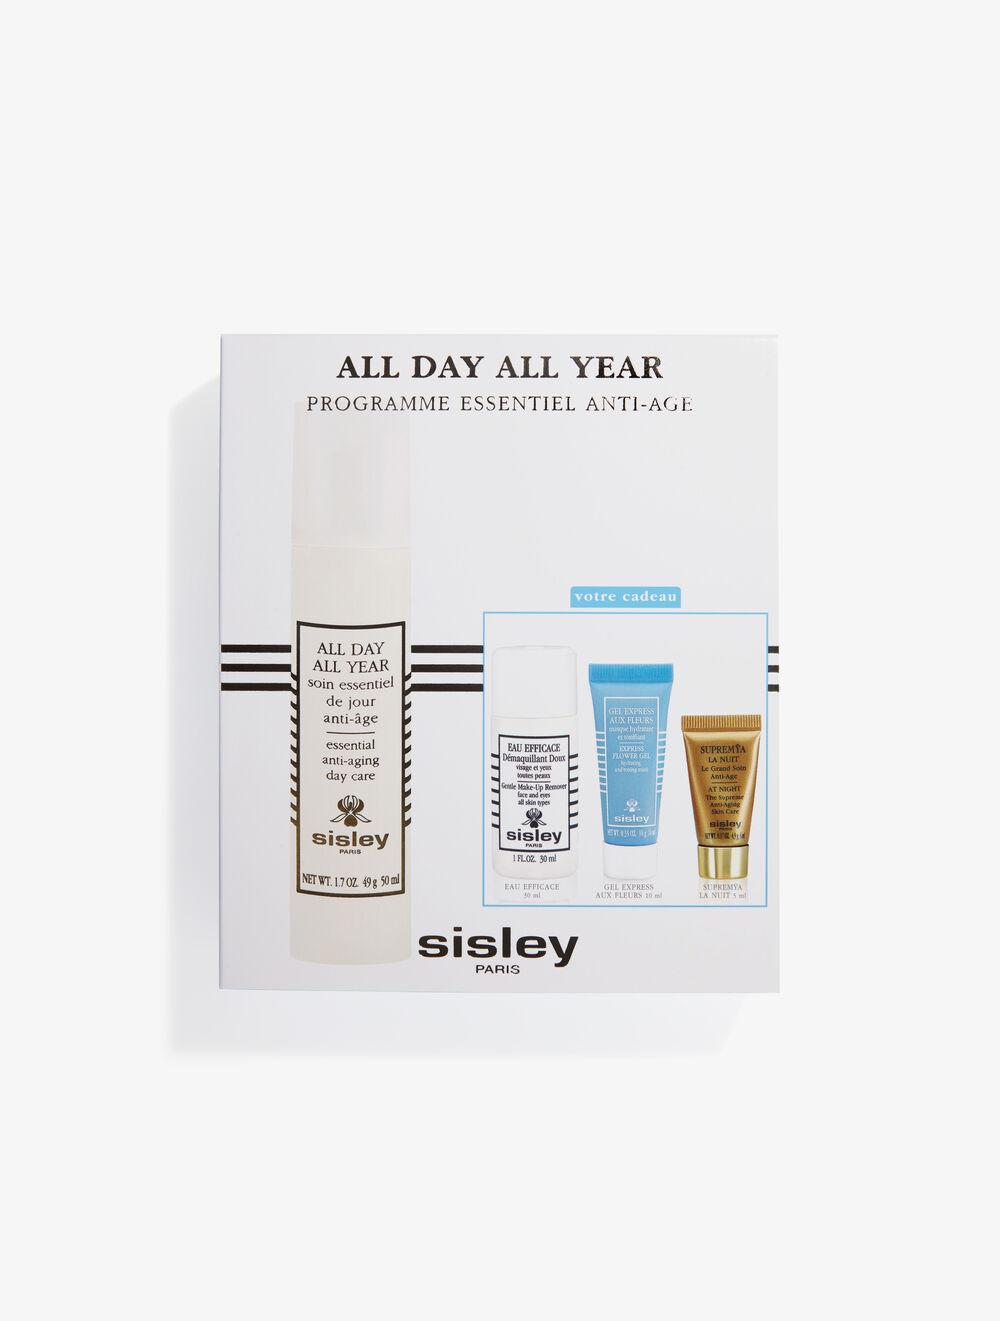 All Day All Year Essential Anti-Aging Program